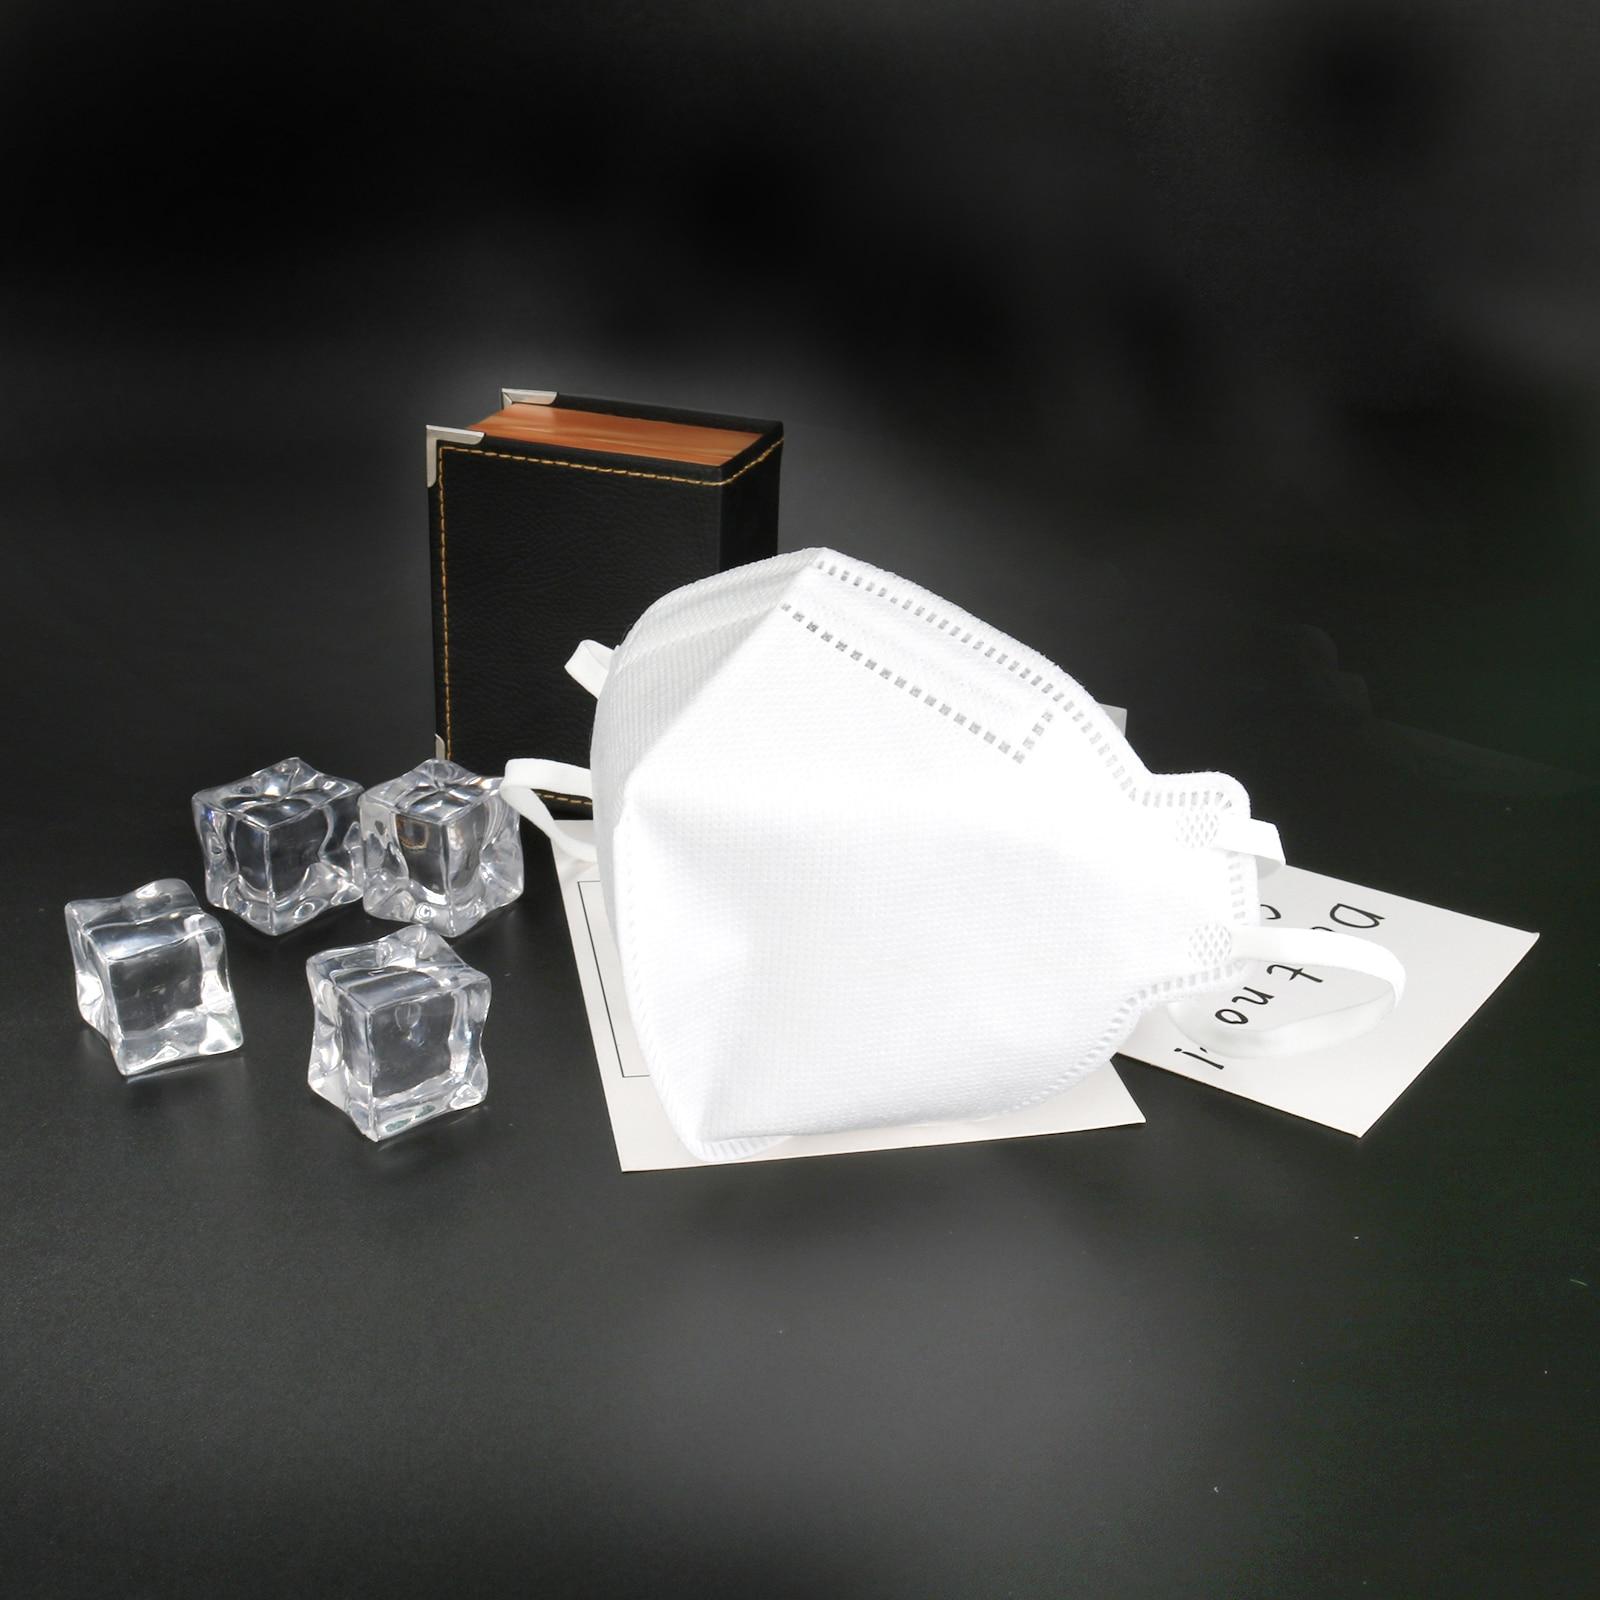 1/2/5/10 Pcs KN95 Mouth Mask Mask Adult Vertical Folding Nonwoven Valved Dust Mask PM 2.5 Respirator Gauze Haza